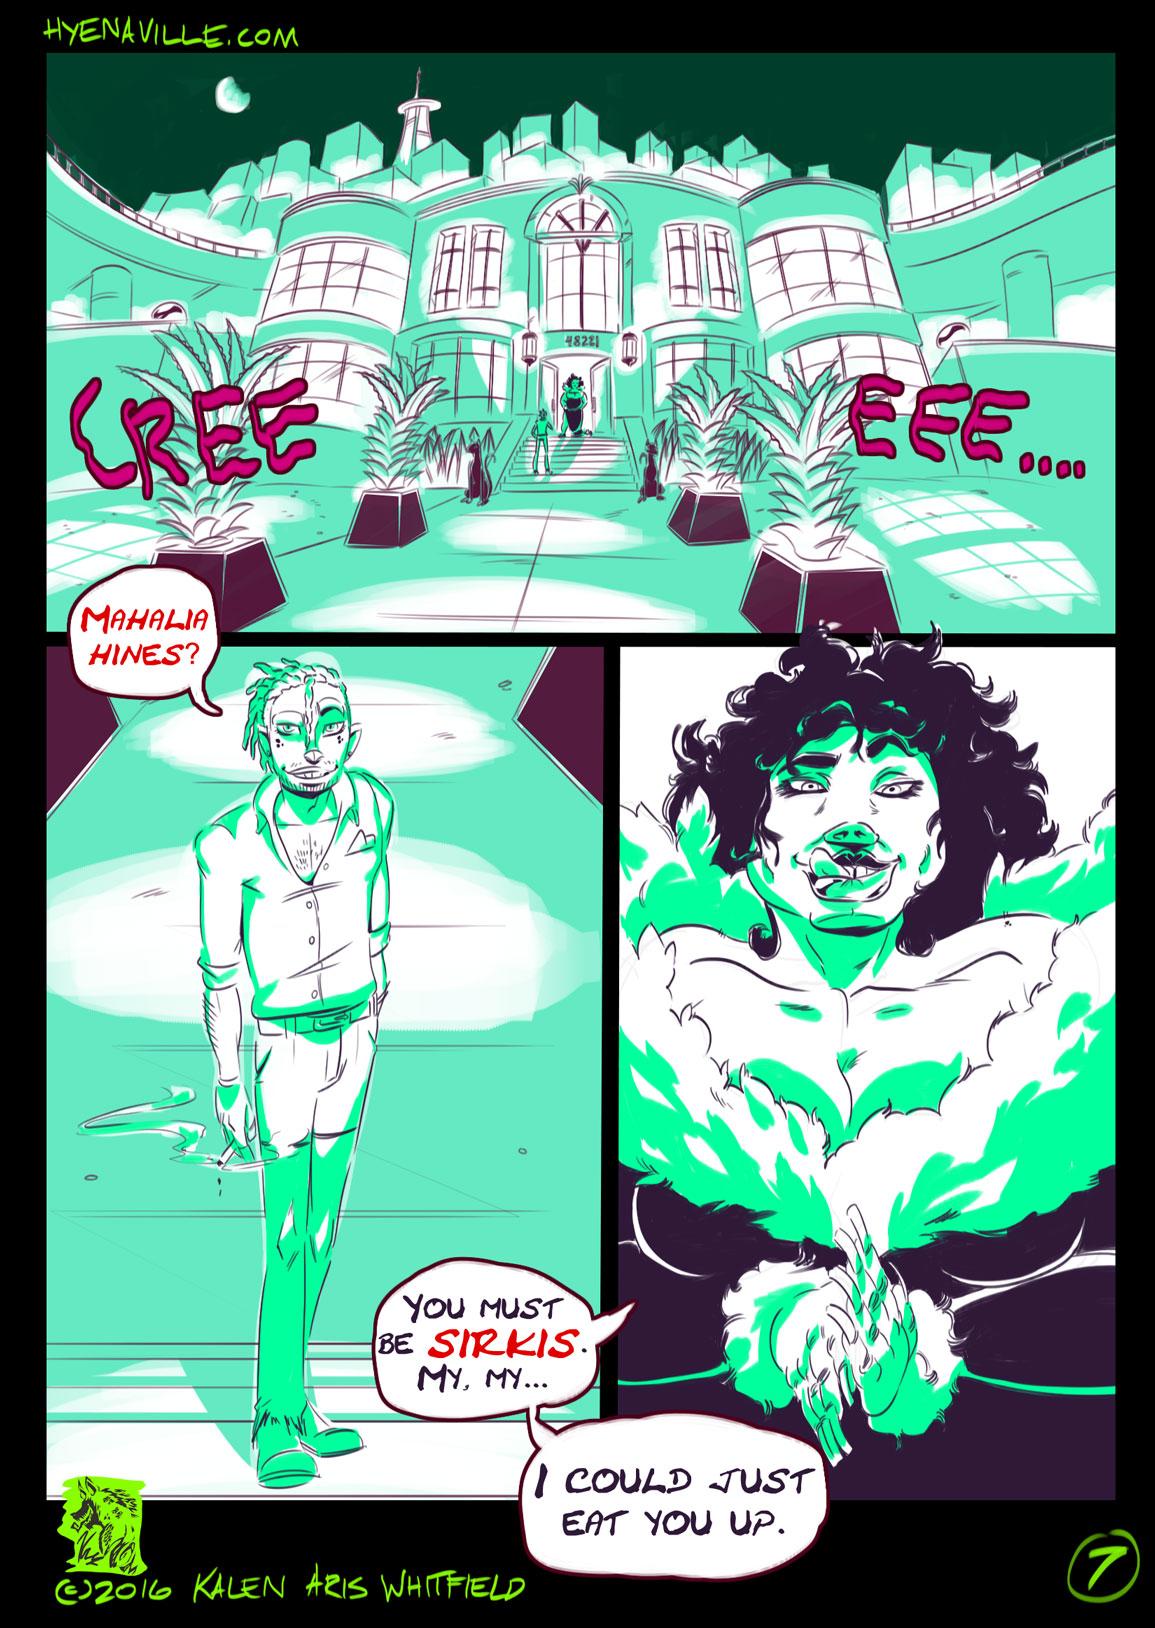 HYENAVILLE page 7